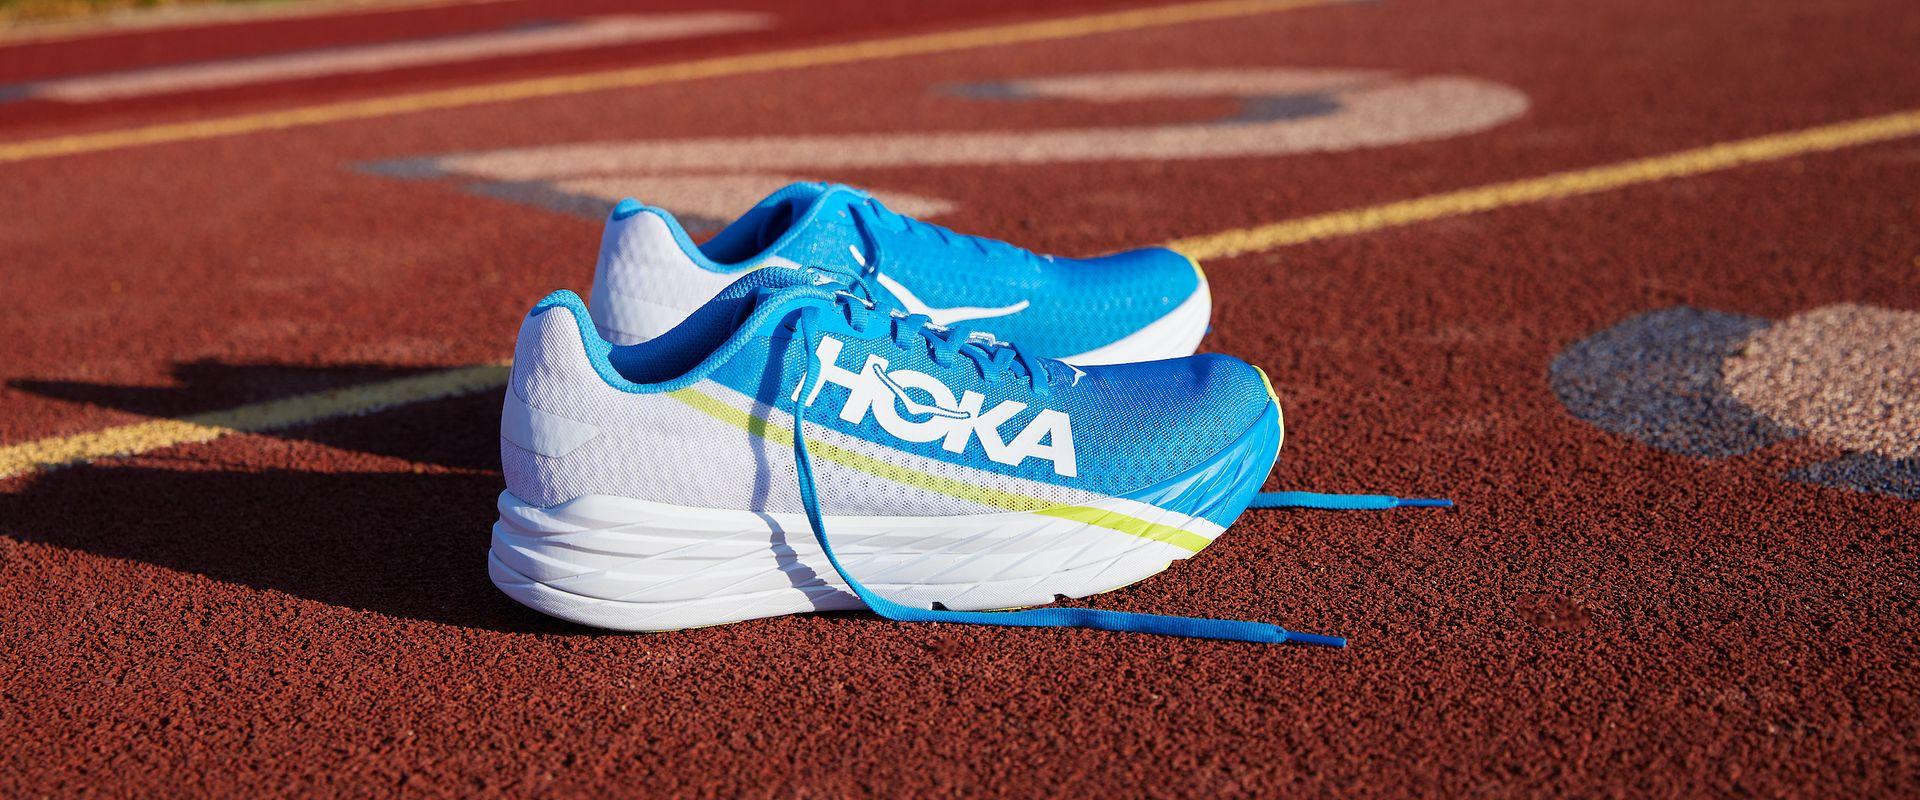 Shoe Review: HOKA ONE ONE Rocket X